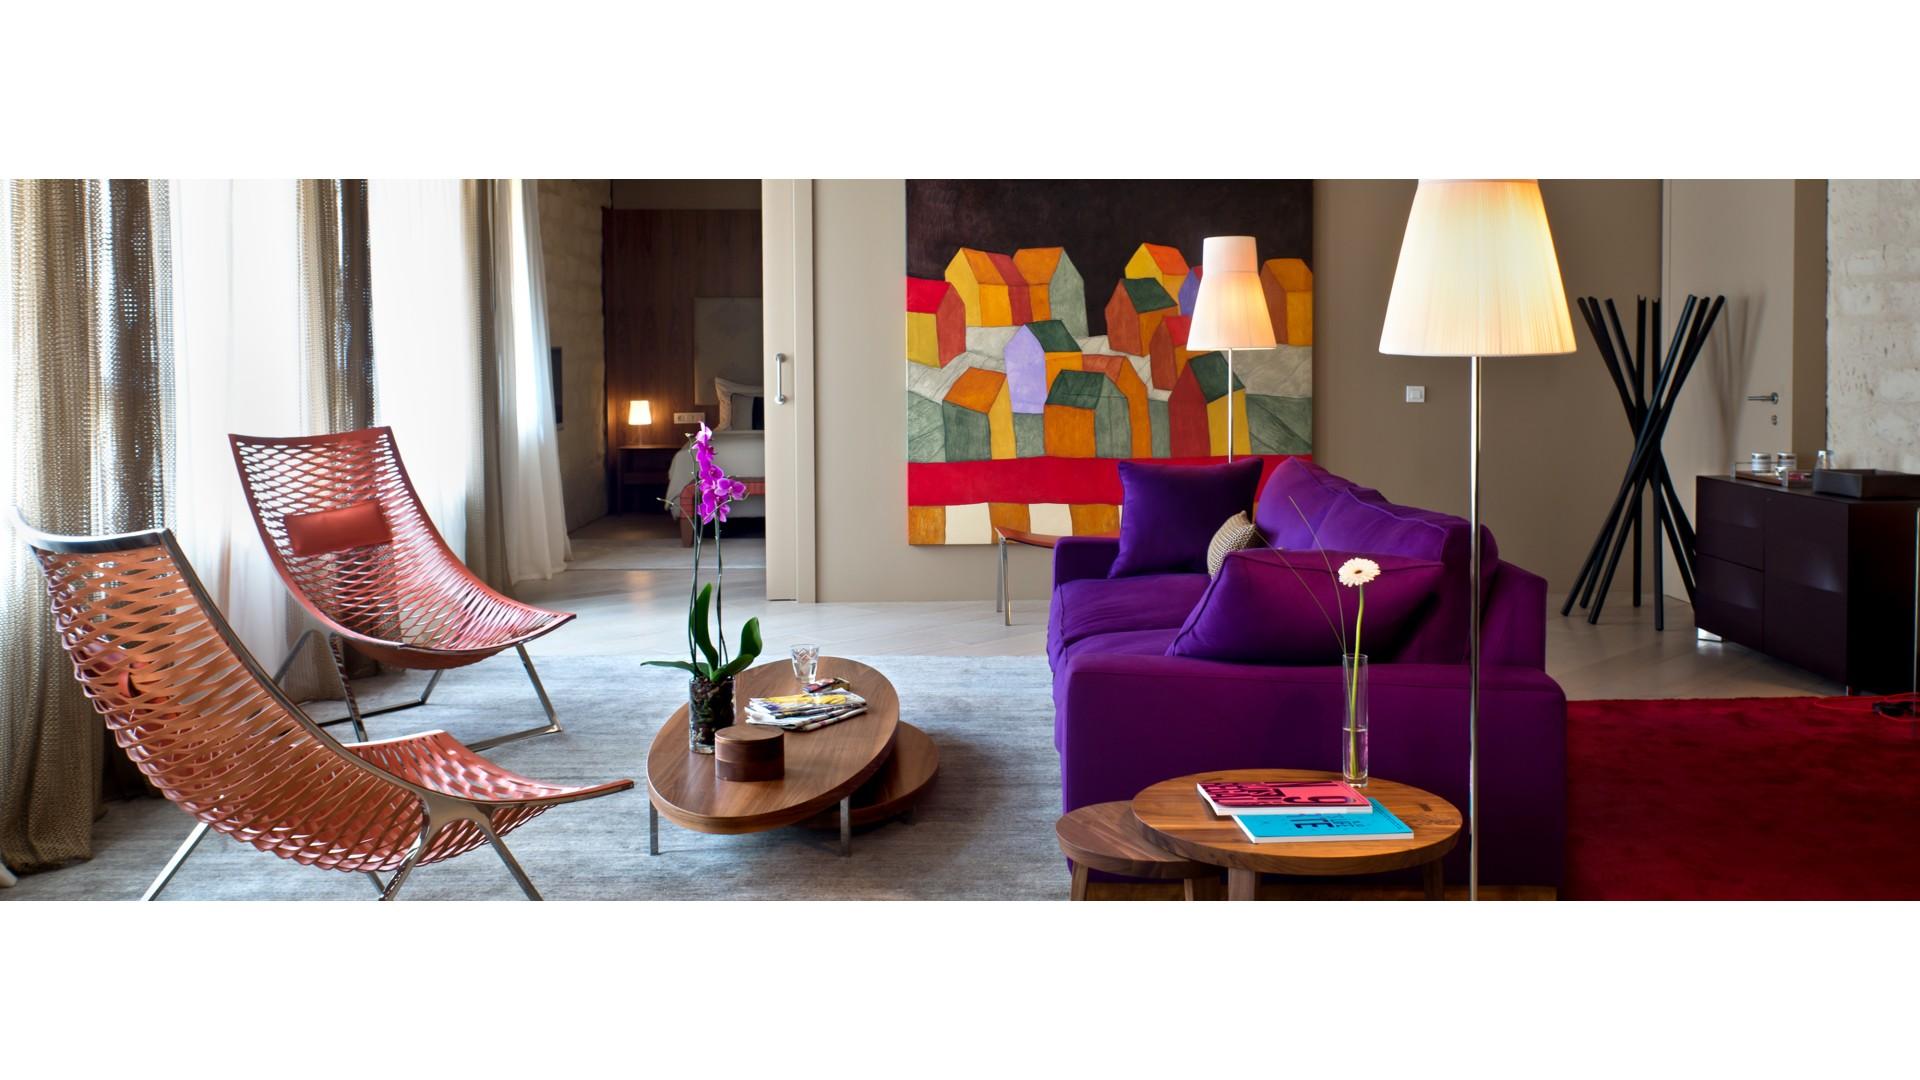 Rooms & Suites at Mercer Hotel Barcelona Barri G²tic Barcelona